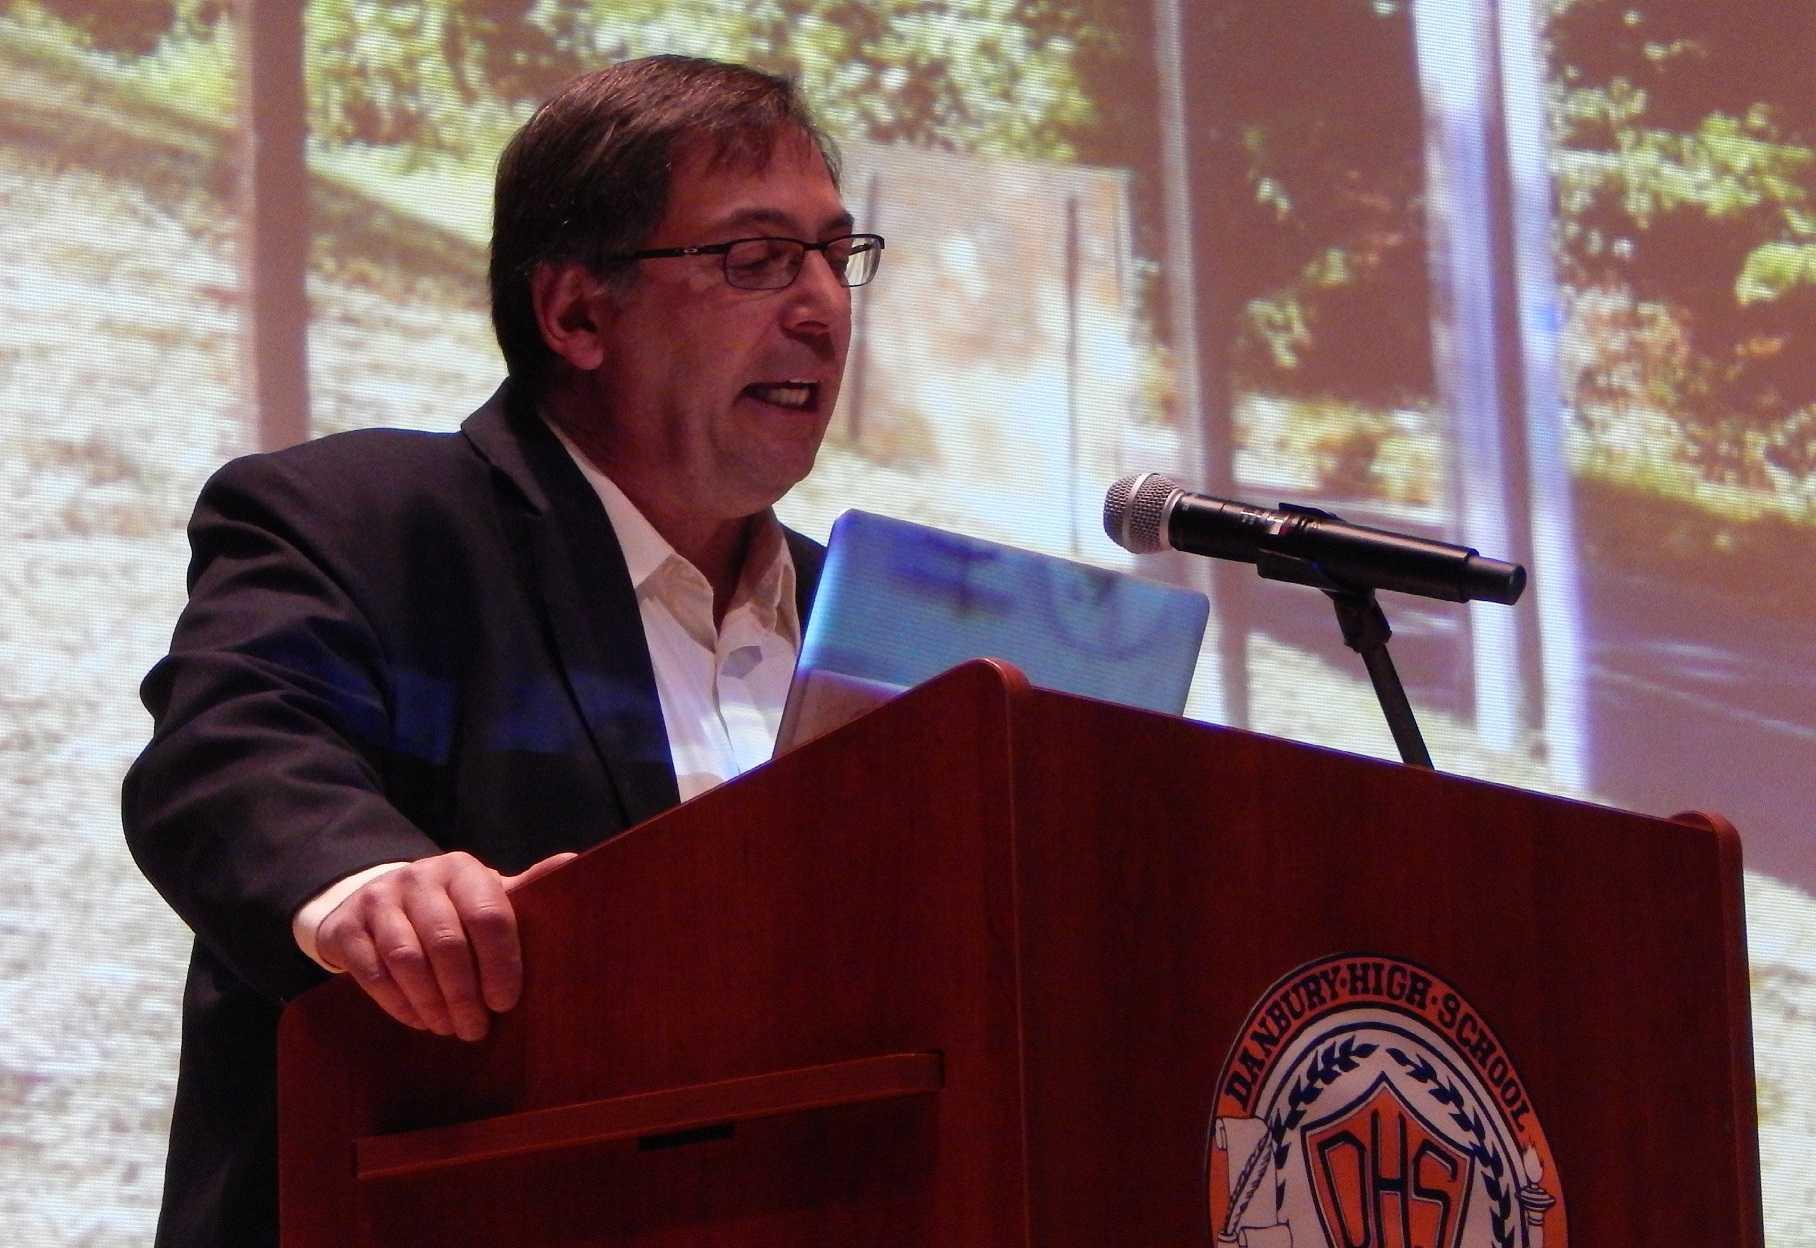 Jim Felice, an award-winning Connecticut based sculptor, addresses NAHS inductees.